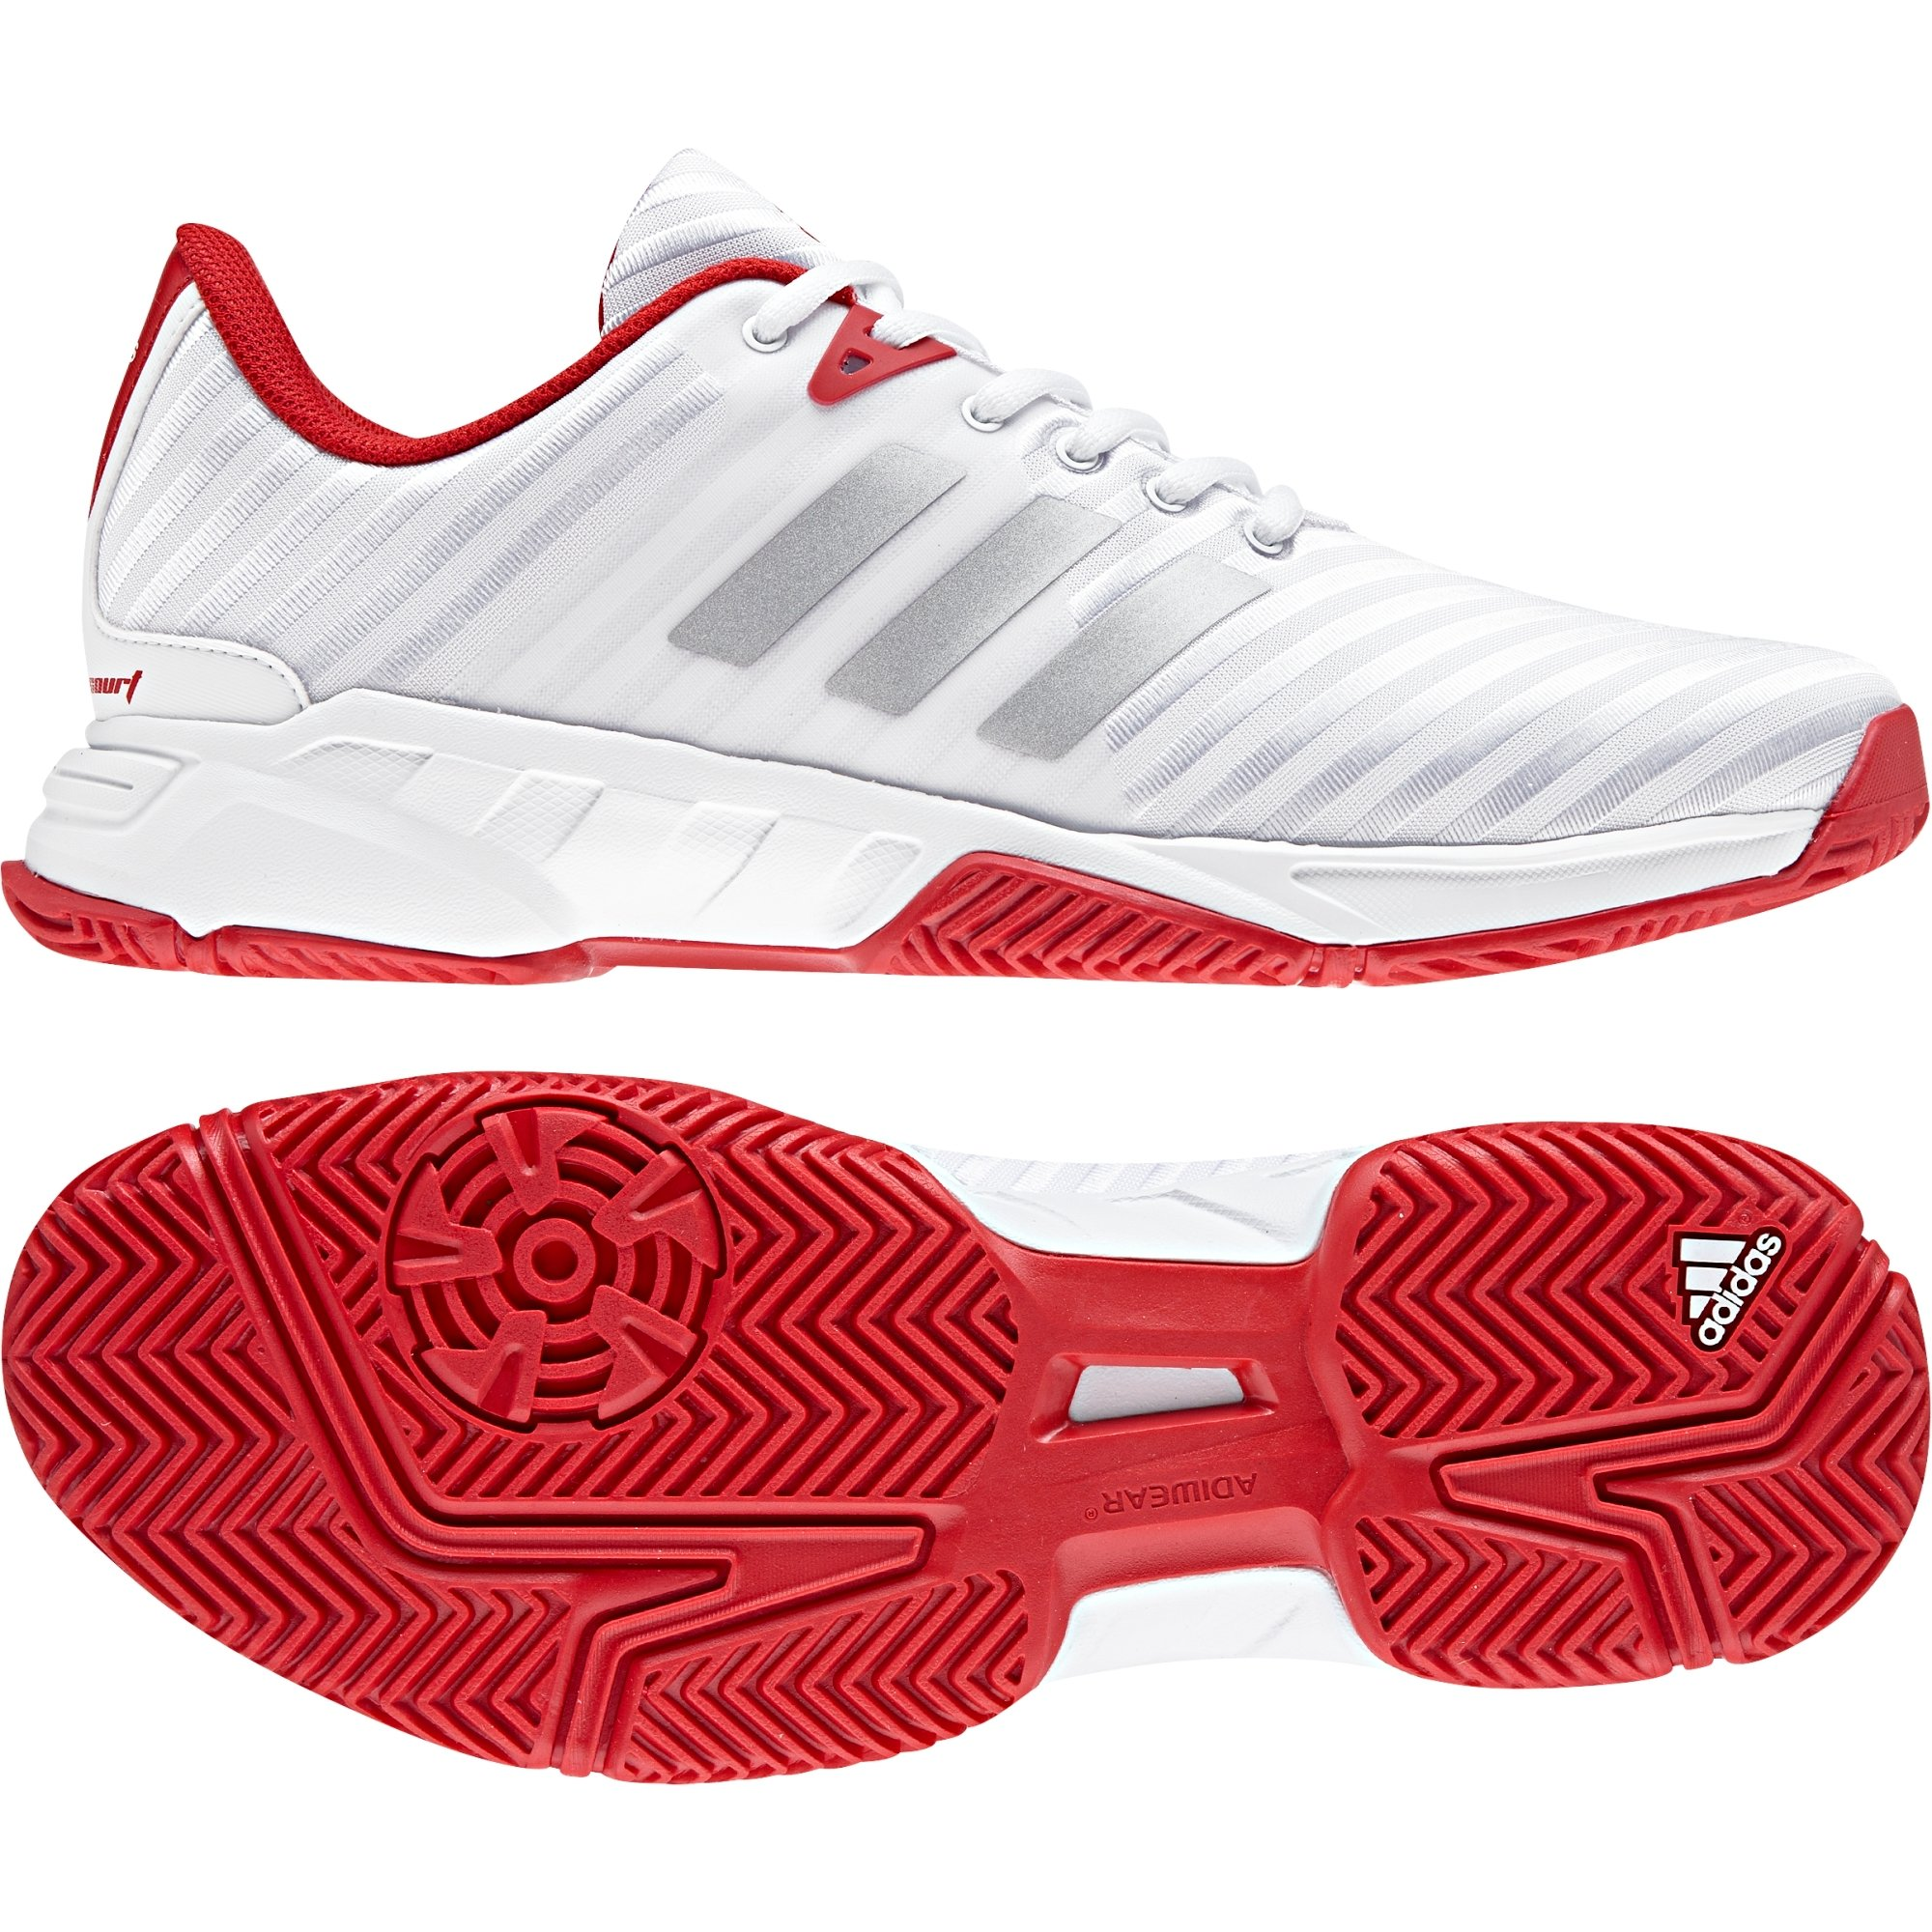 buty męskie adidas Barricade r 42 23 CM7814 tenis